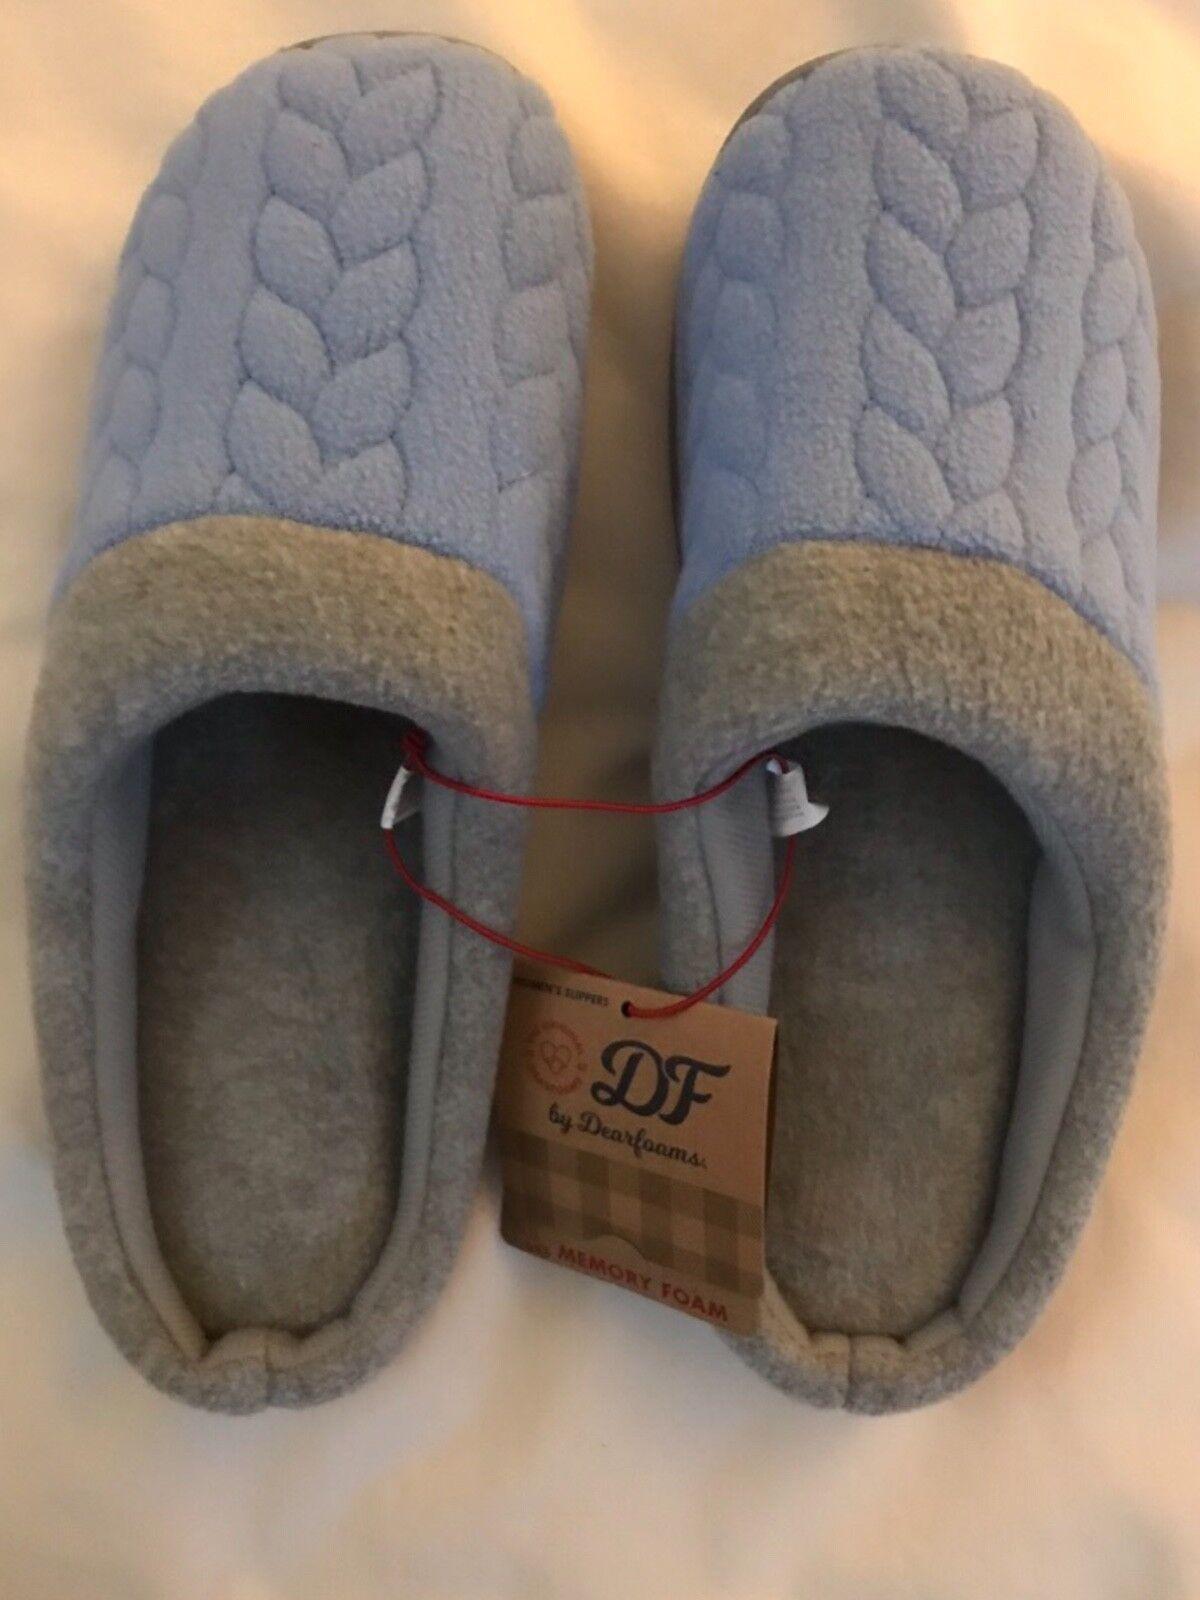 NEW Women's Dearform Slippers Clog Slippers Dearform Size L(9-10) 79c559